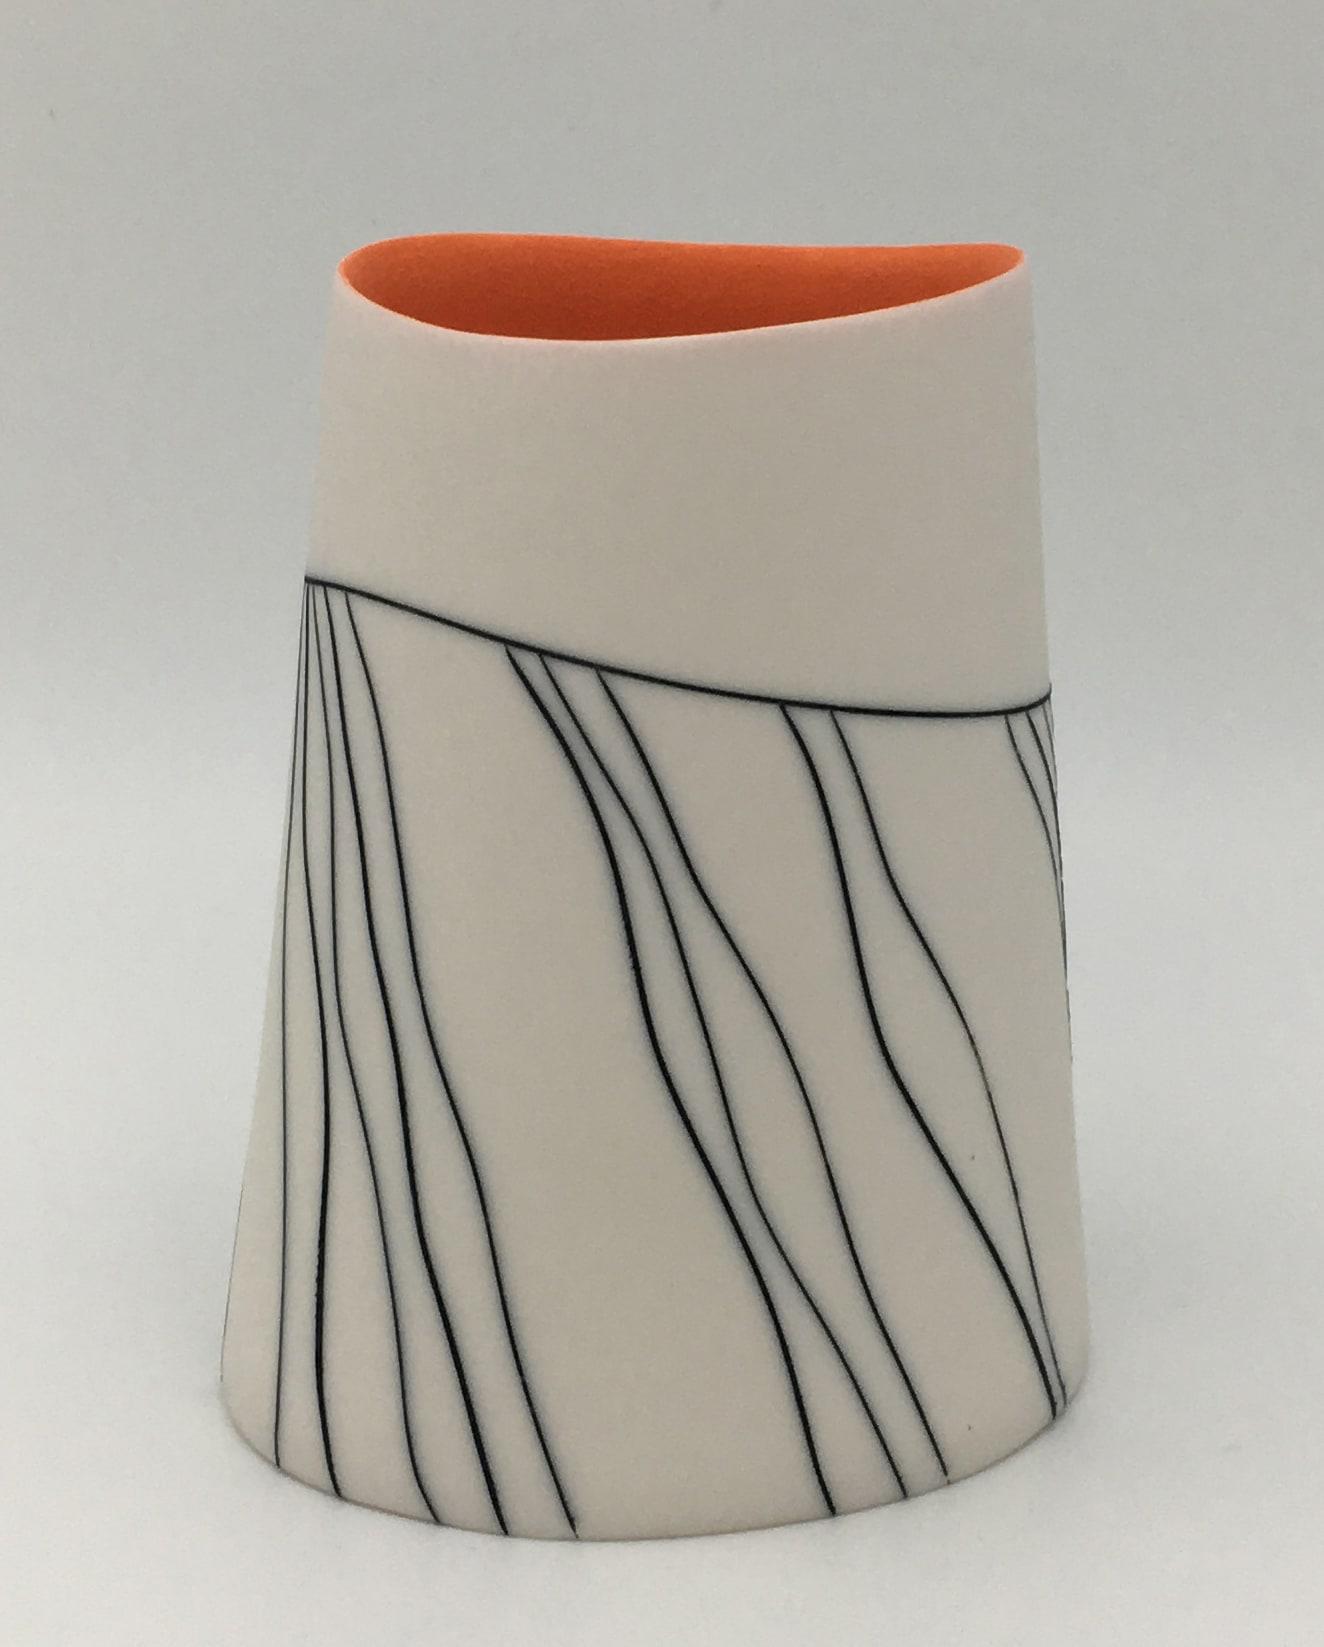 "<span class=""link fancybox-details-link""><a href=""/artists/195-lara-scobie/works/6516-lara-scobie-oval-vase-with-wave-pattern-2019/"">View Detail Page</a></span><div class=""artist""><strong>Lara Scobie</strong></div> b. 1967 <div class=""title""><em>Oval Vase with Wave Pattern </em>, 2019</div> <div class=""medium"">Porcelain</div><div class=""copyright_line"">Own Art: £18 x 10 Months, 0% APR</div>"